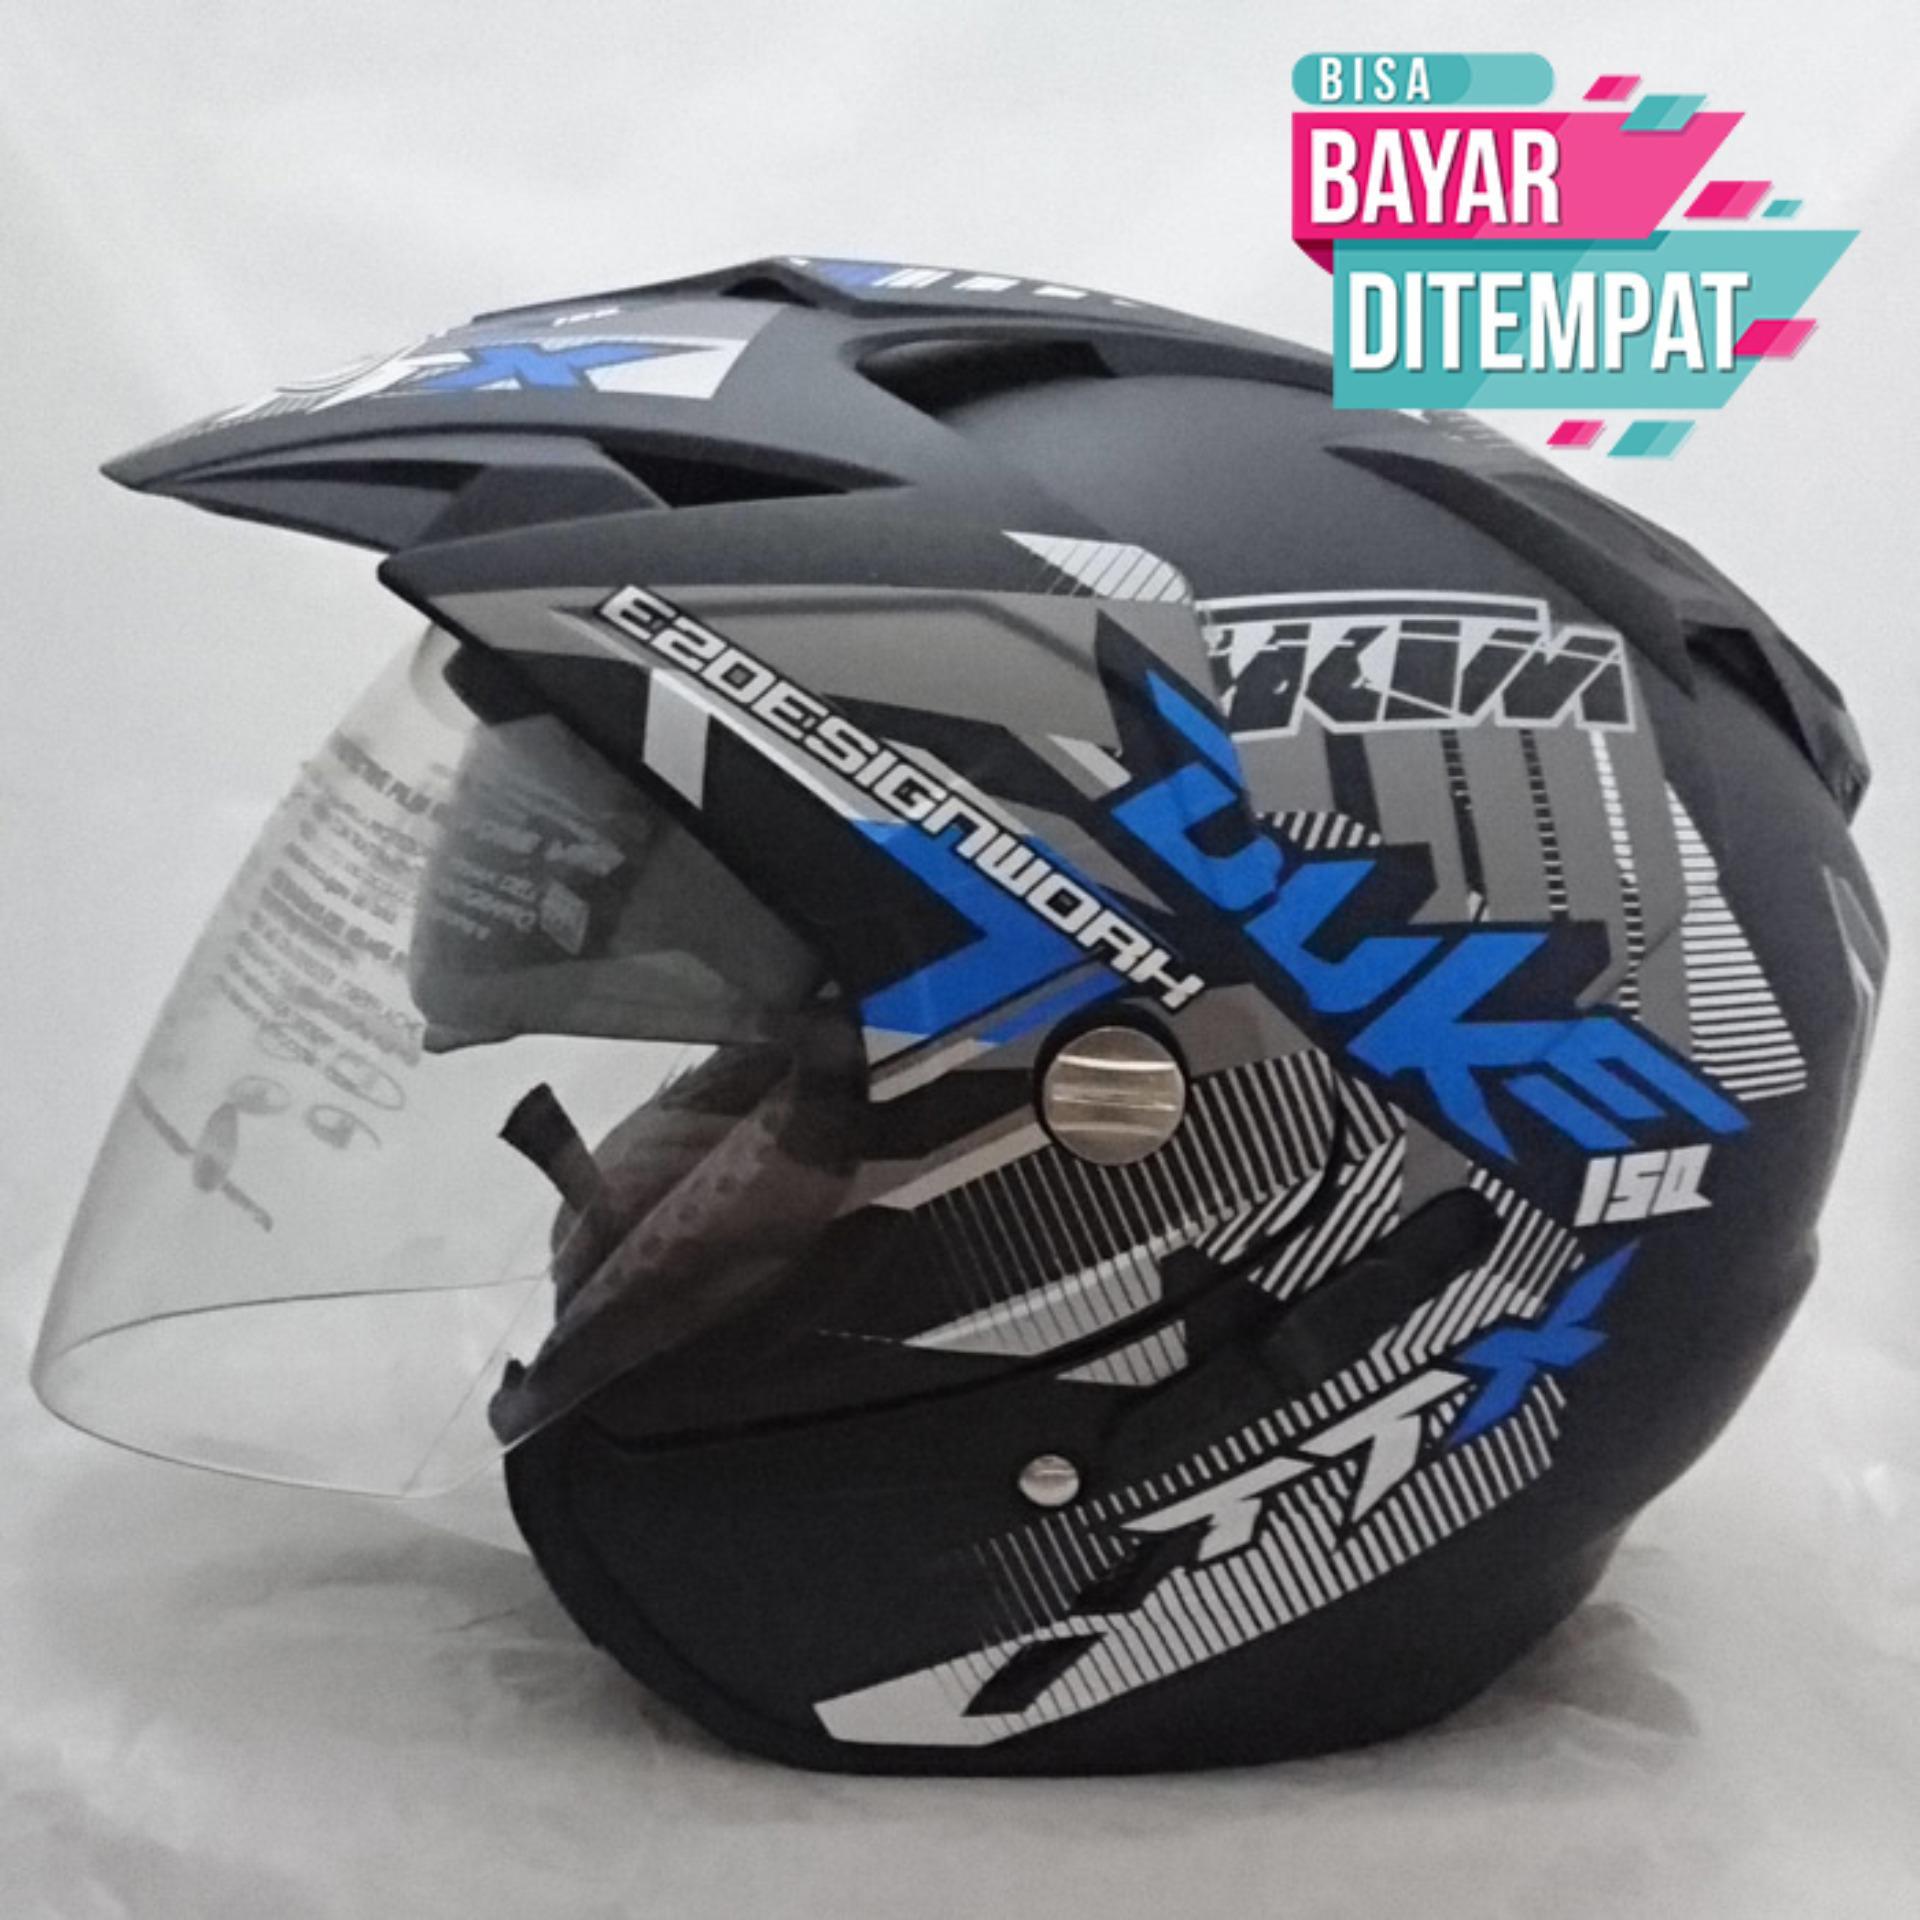 Flash Sale Gratis Ongkir Bisa Bayar ditempat Gratis packing 1 Box Khusus - Helmet DMN BXP